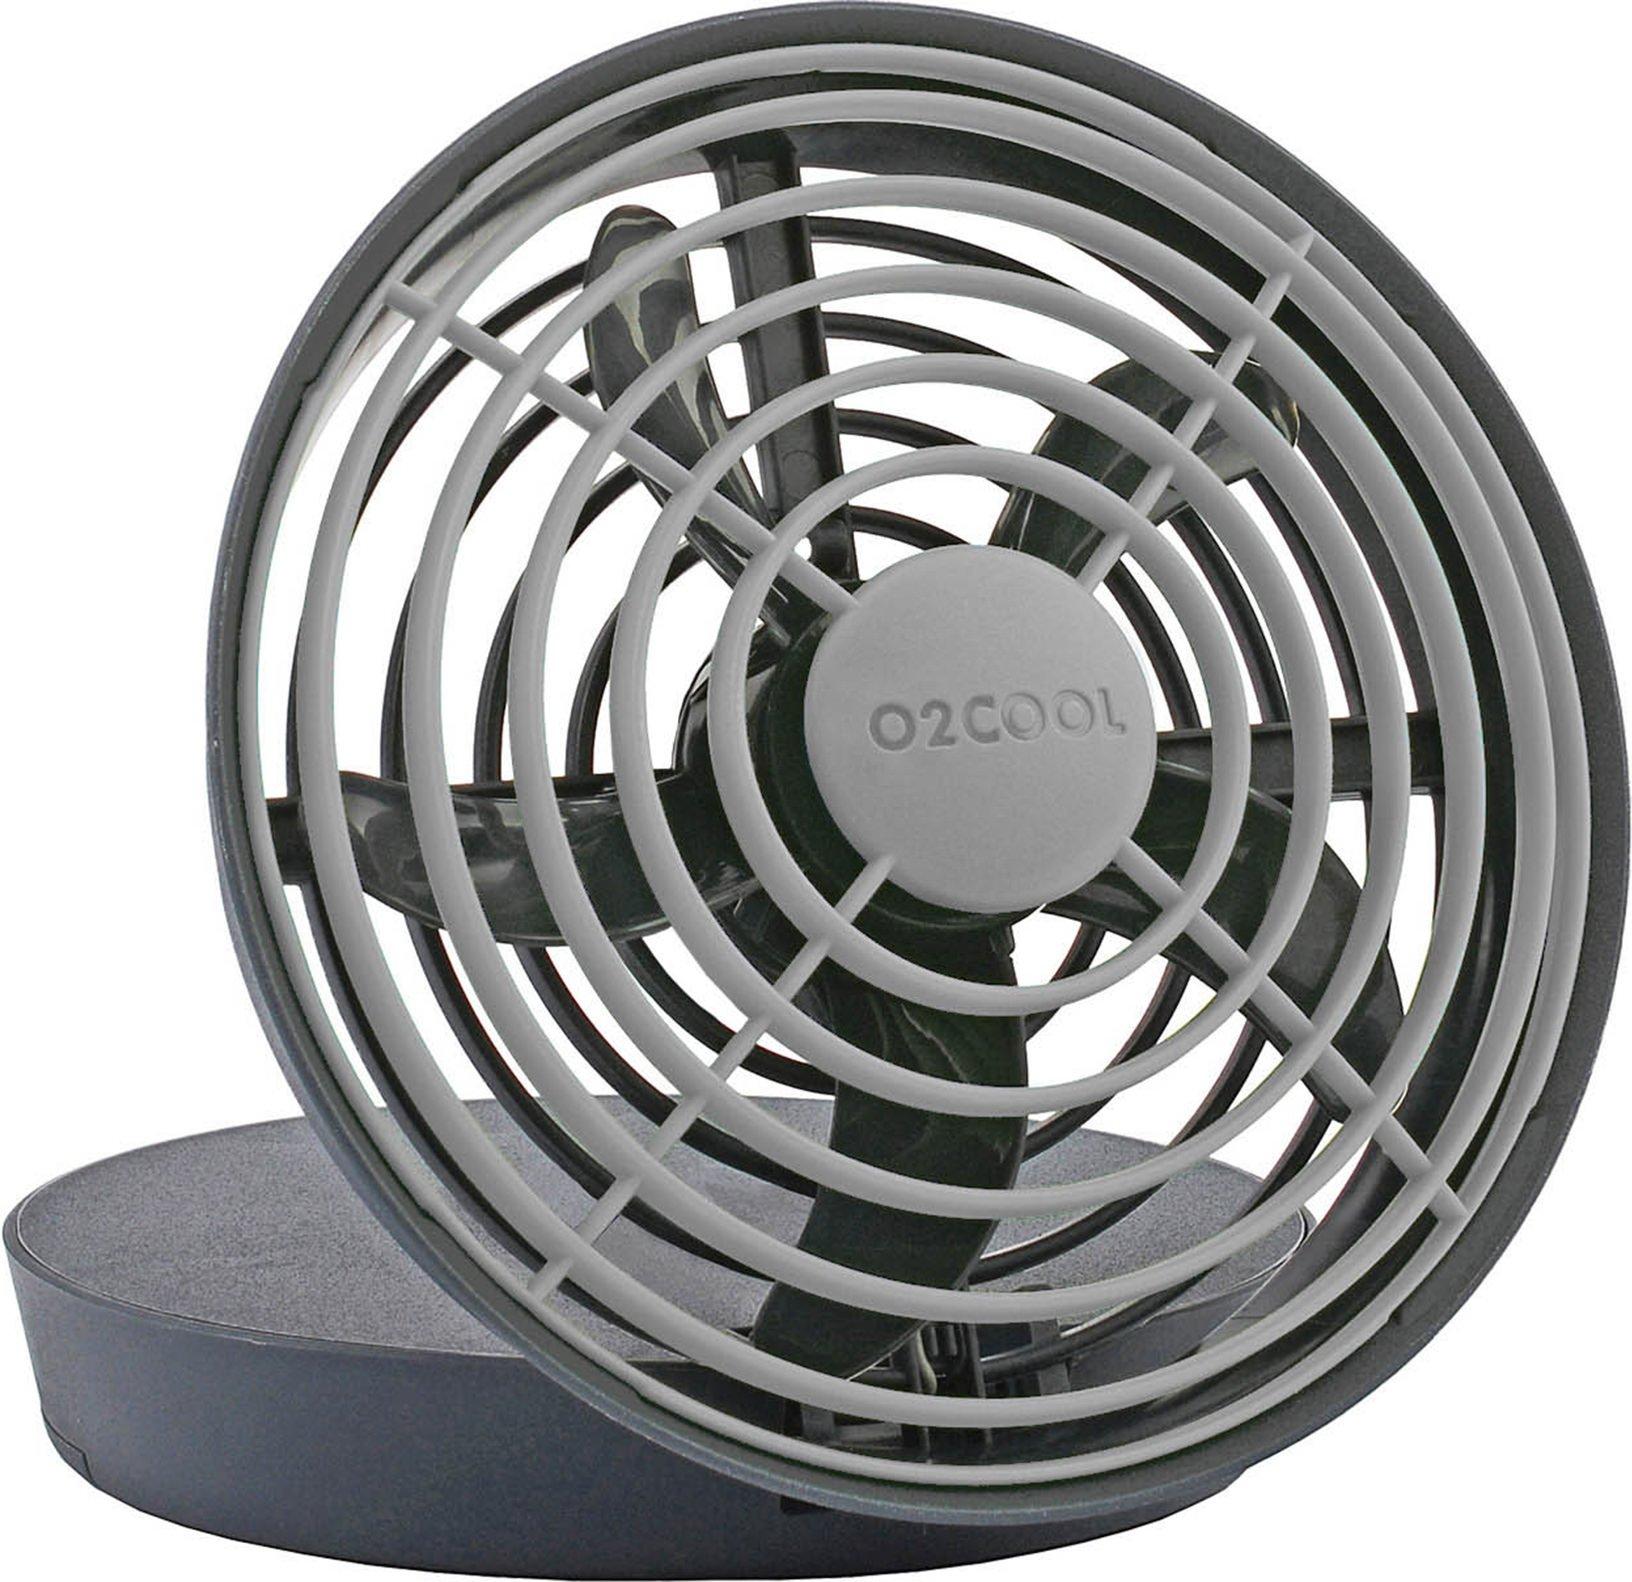 O2COOL 5-Inch Portable USB Jet Fan,Grey